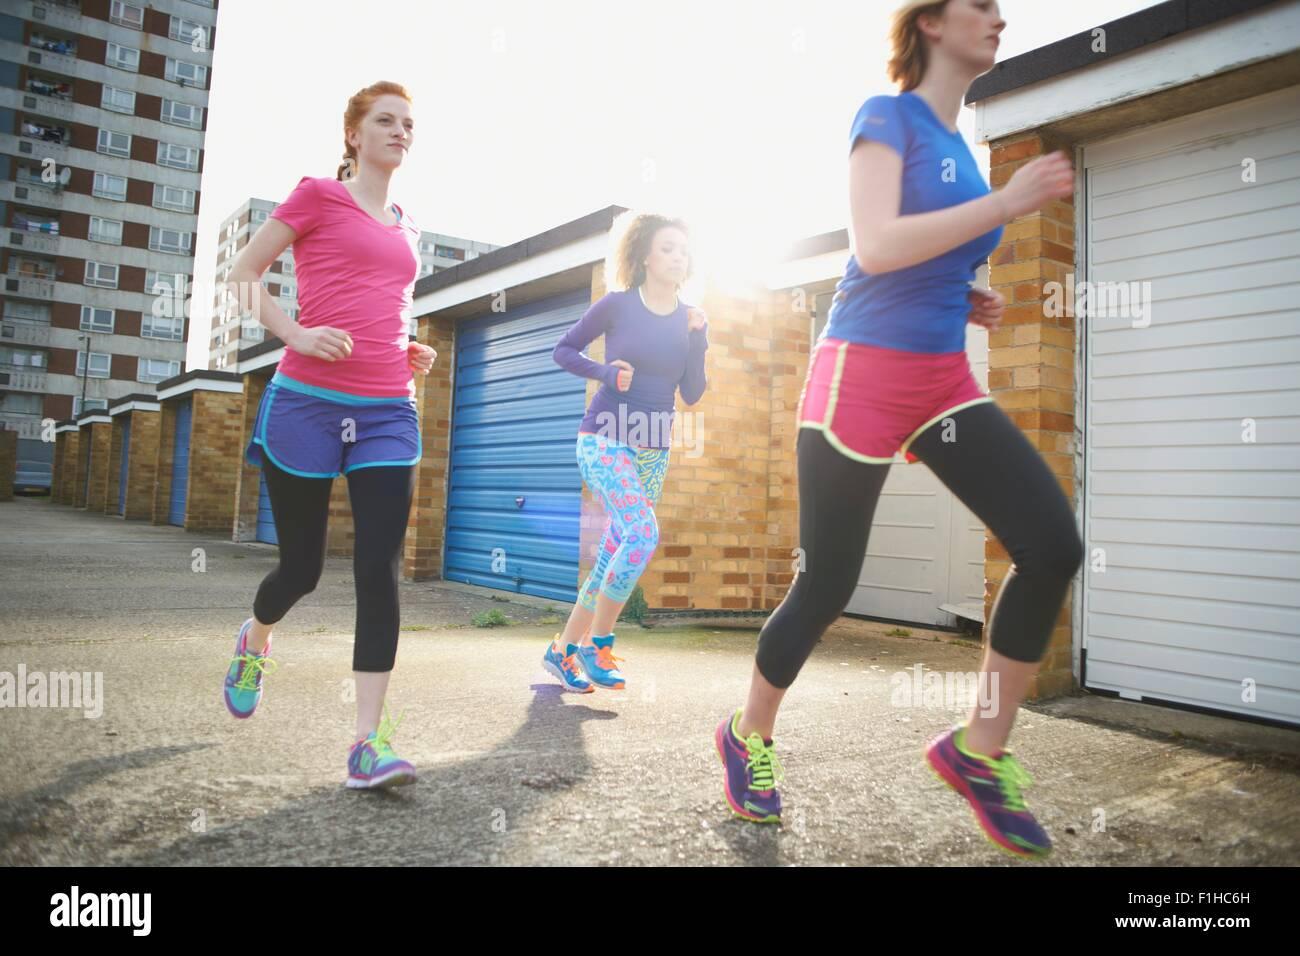 Trois femmes jogging ensemble Photo Stock